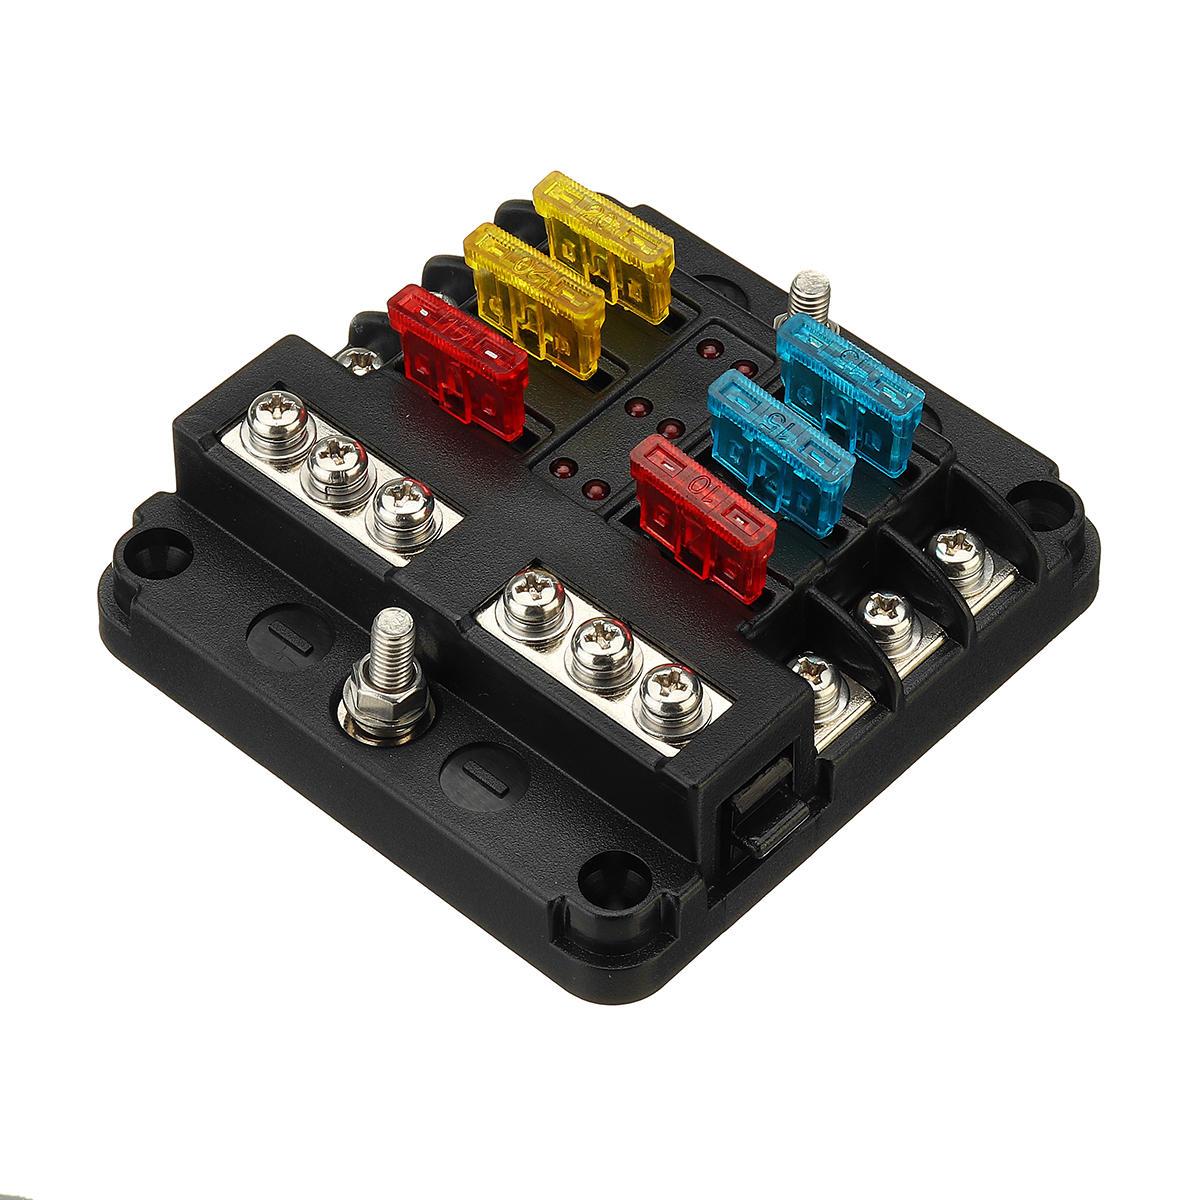 hight resolution of 12v 24v 6 way blade fuse holder box block case for car truck boat 12v marine fuse box